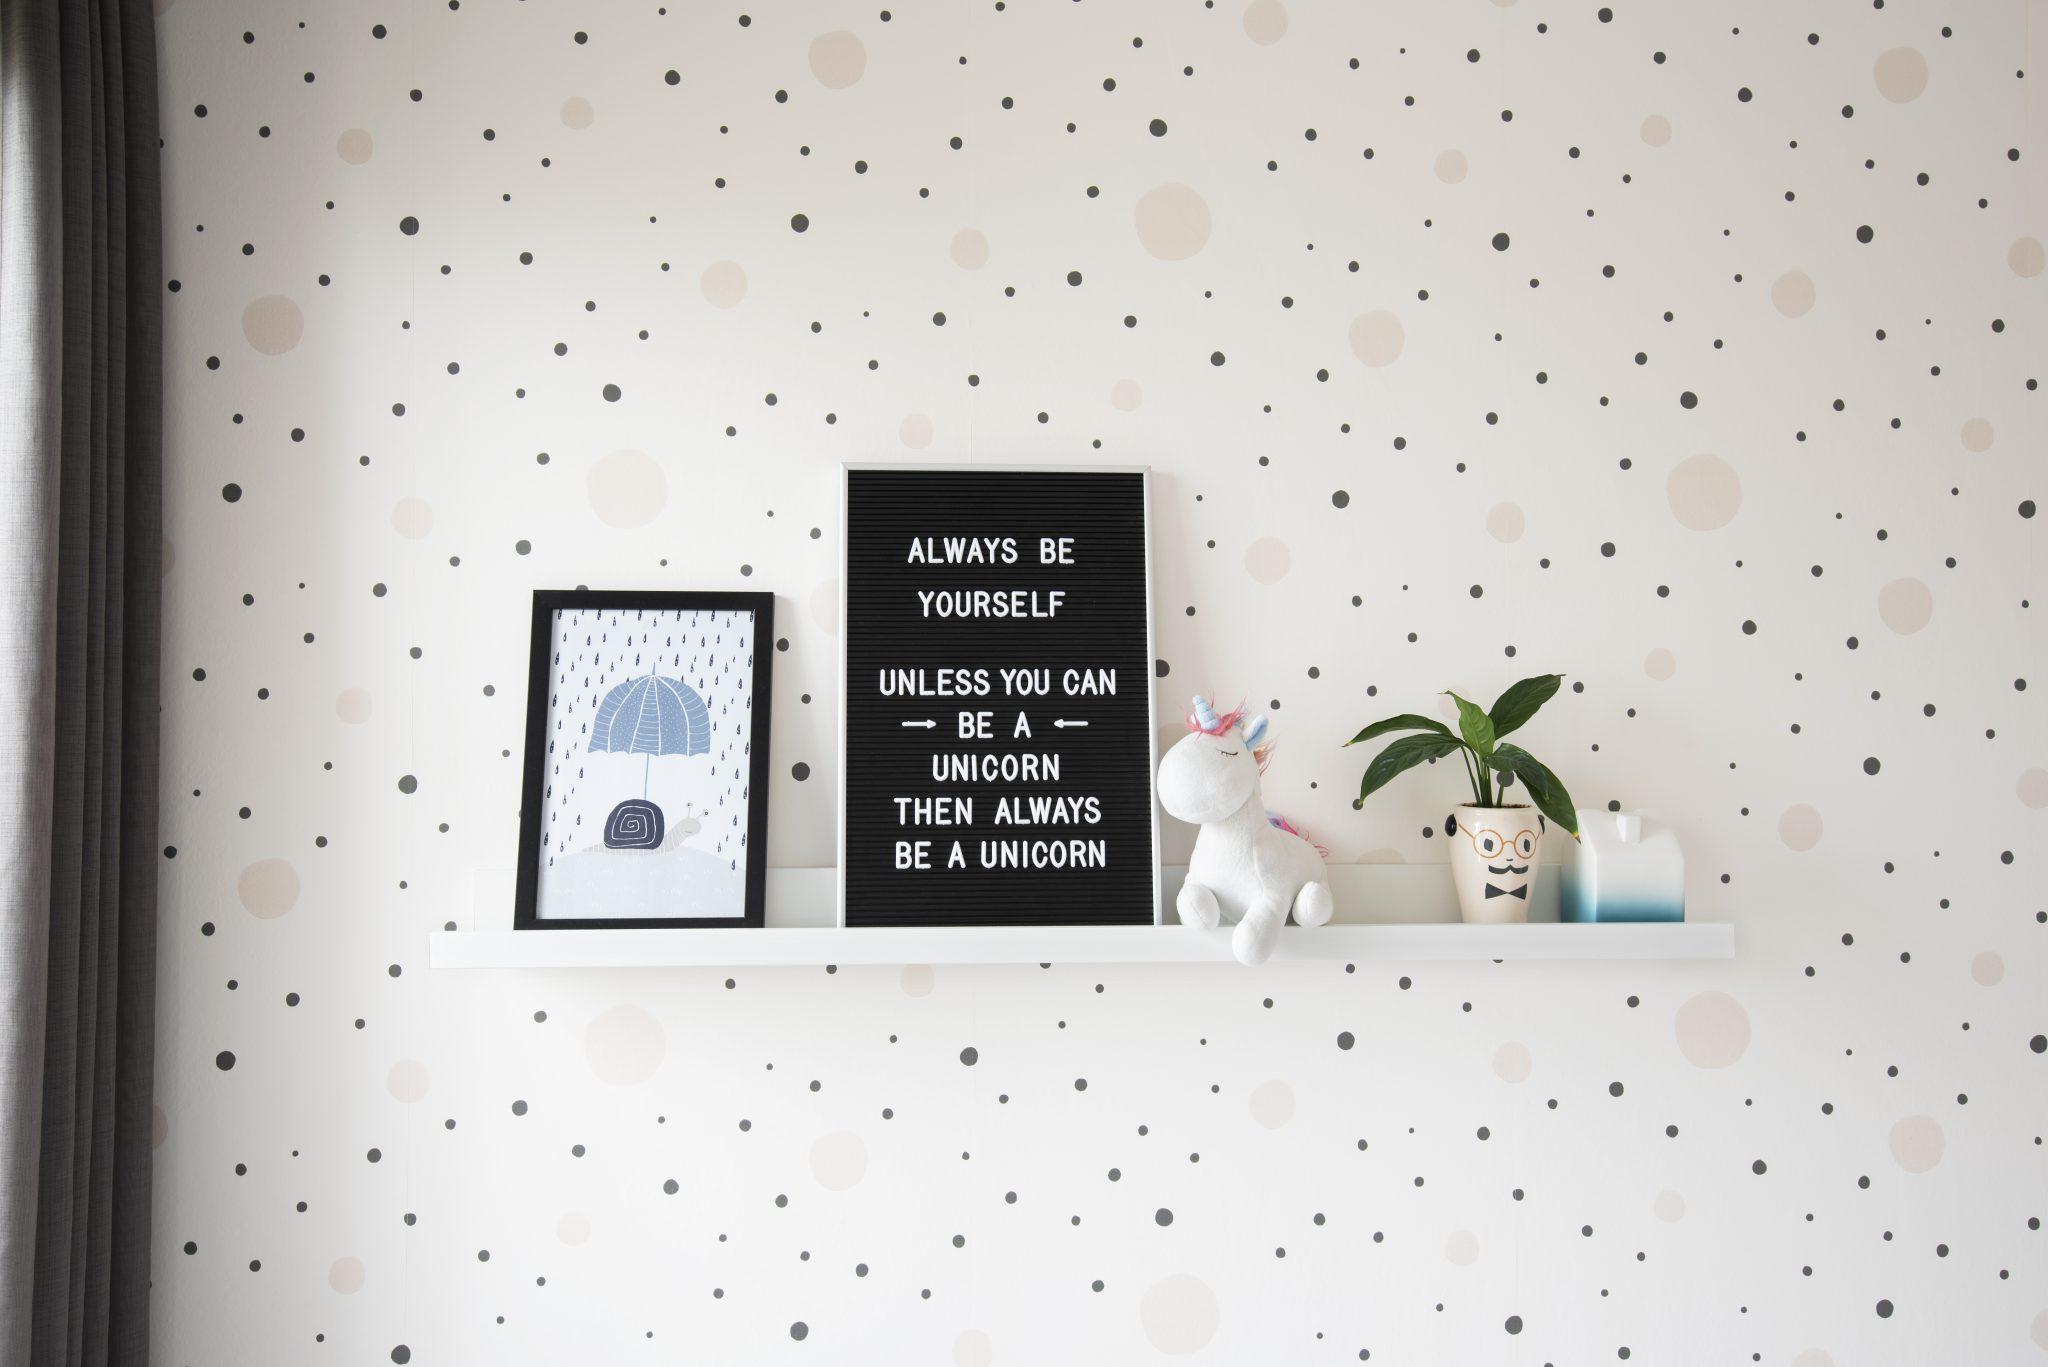 Unicorn_letterbord_interieur_styling_majvillan